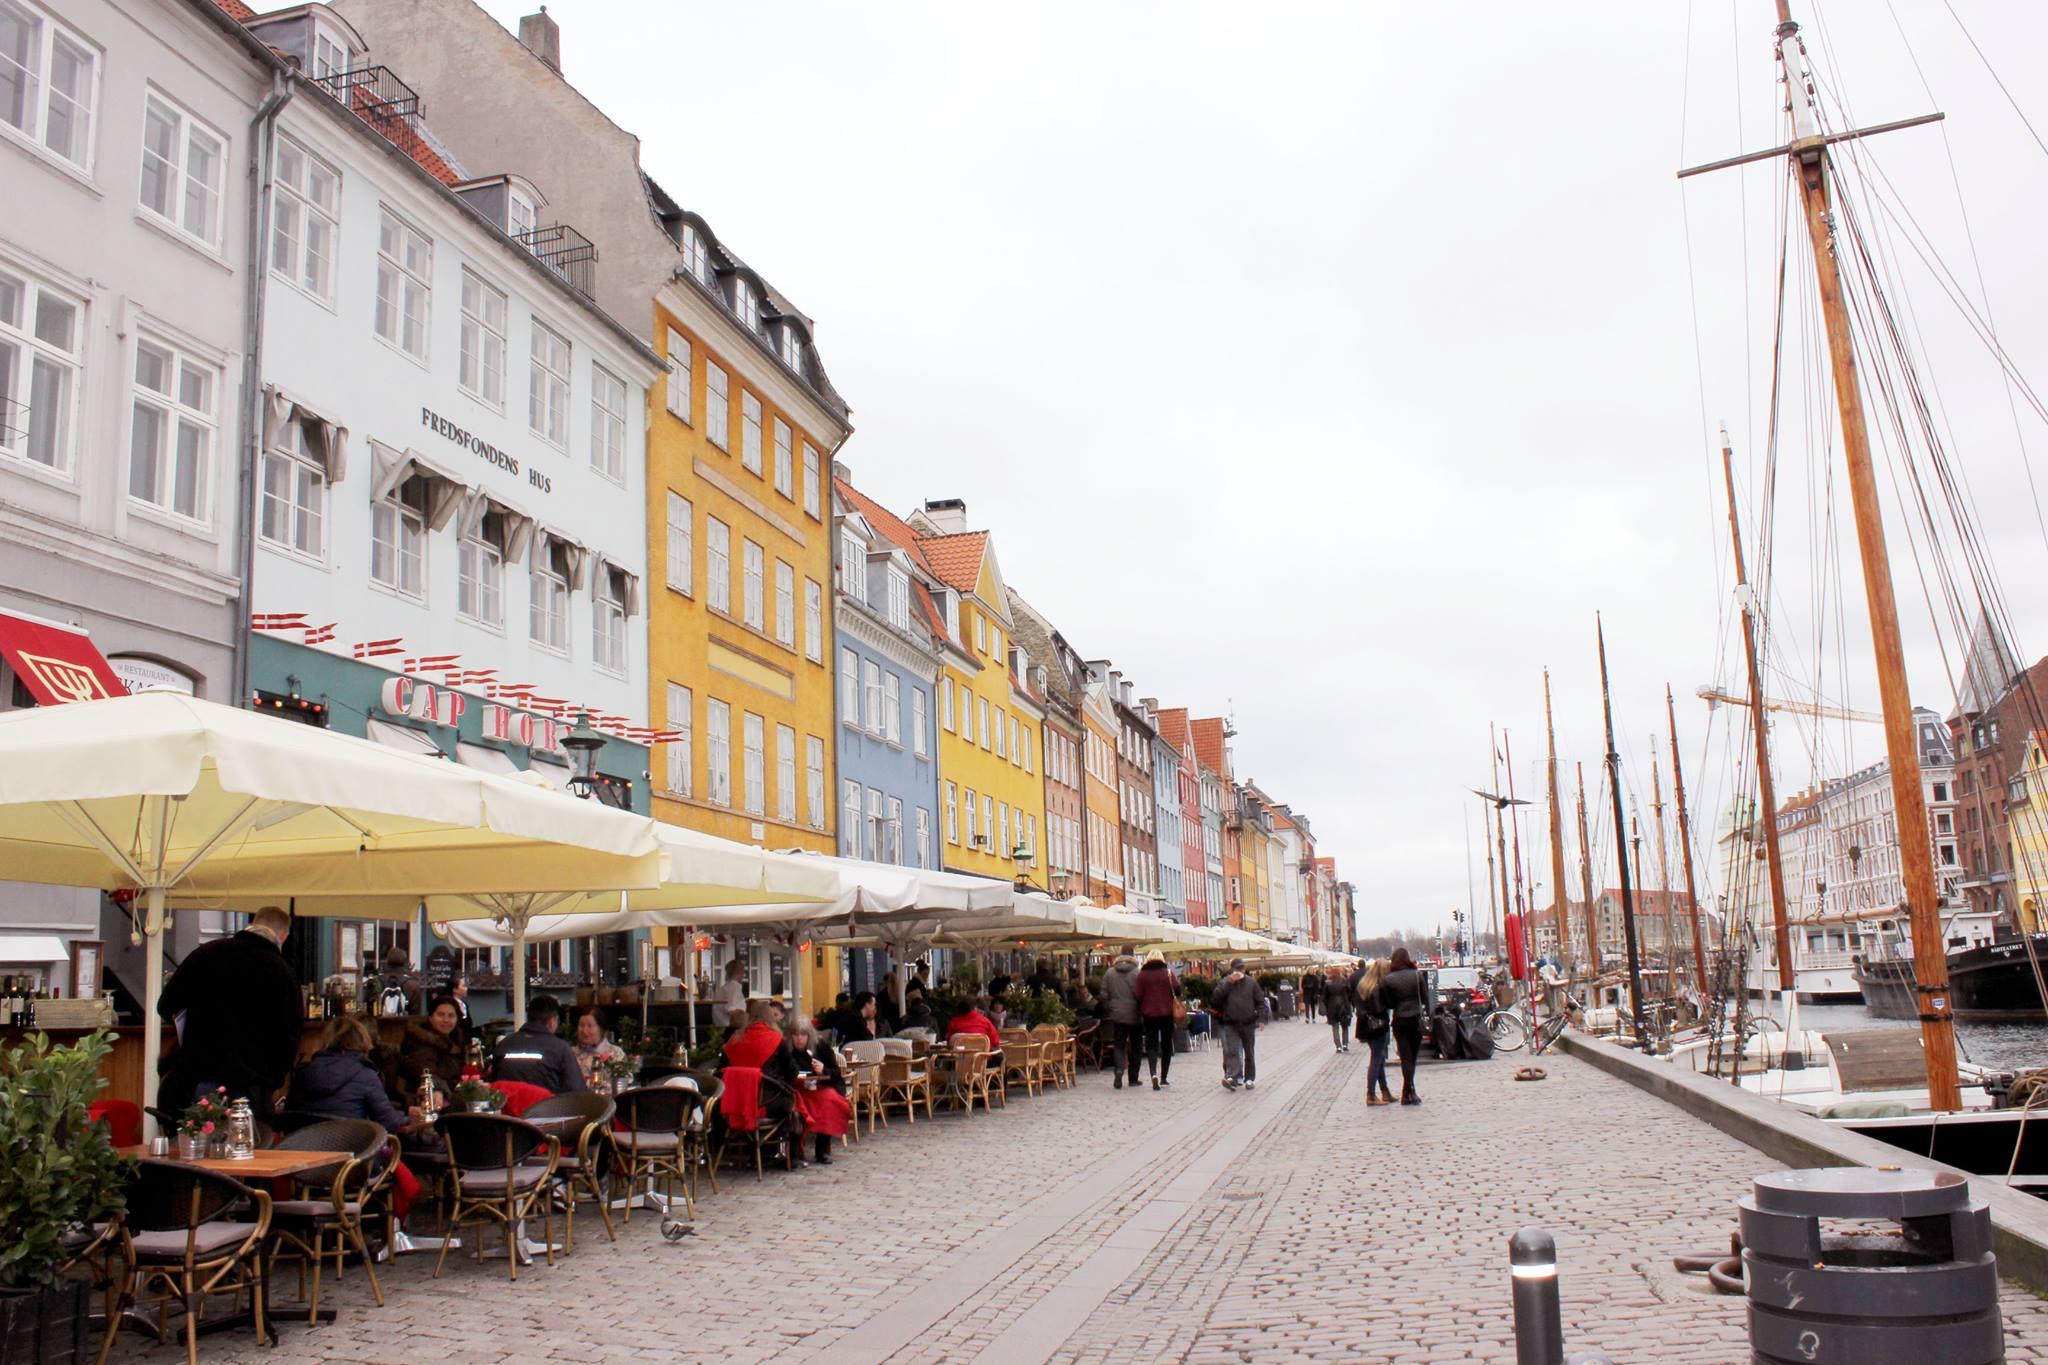 Passeggiata lungo i canali di Copenaghen